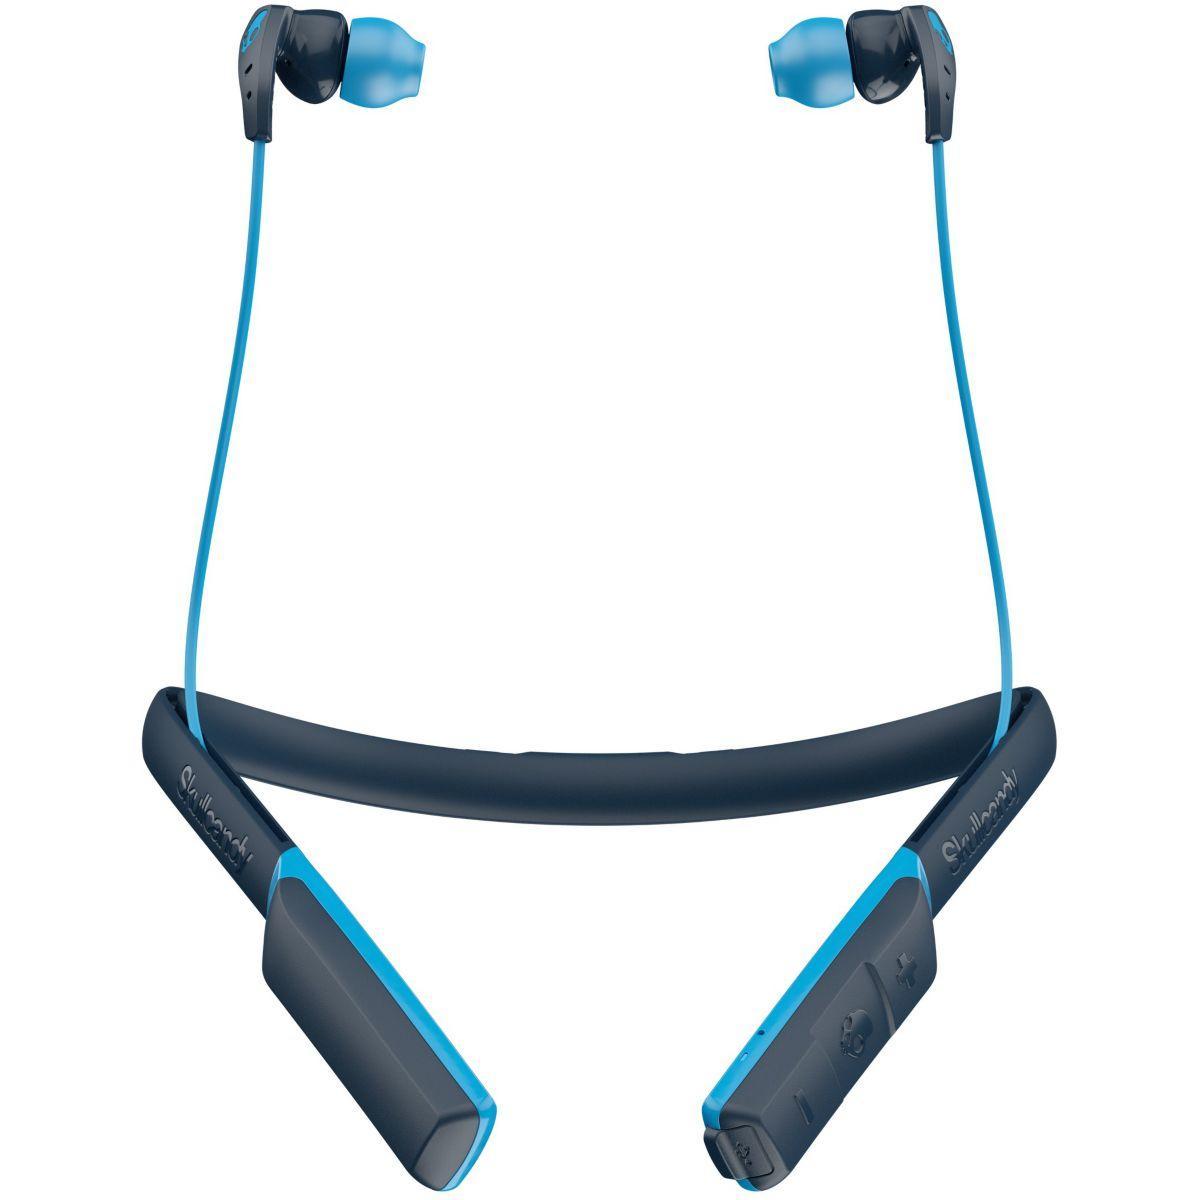 Casque sport skullcandy method wireless bleu - livraison offerte : code livprem